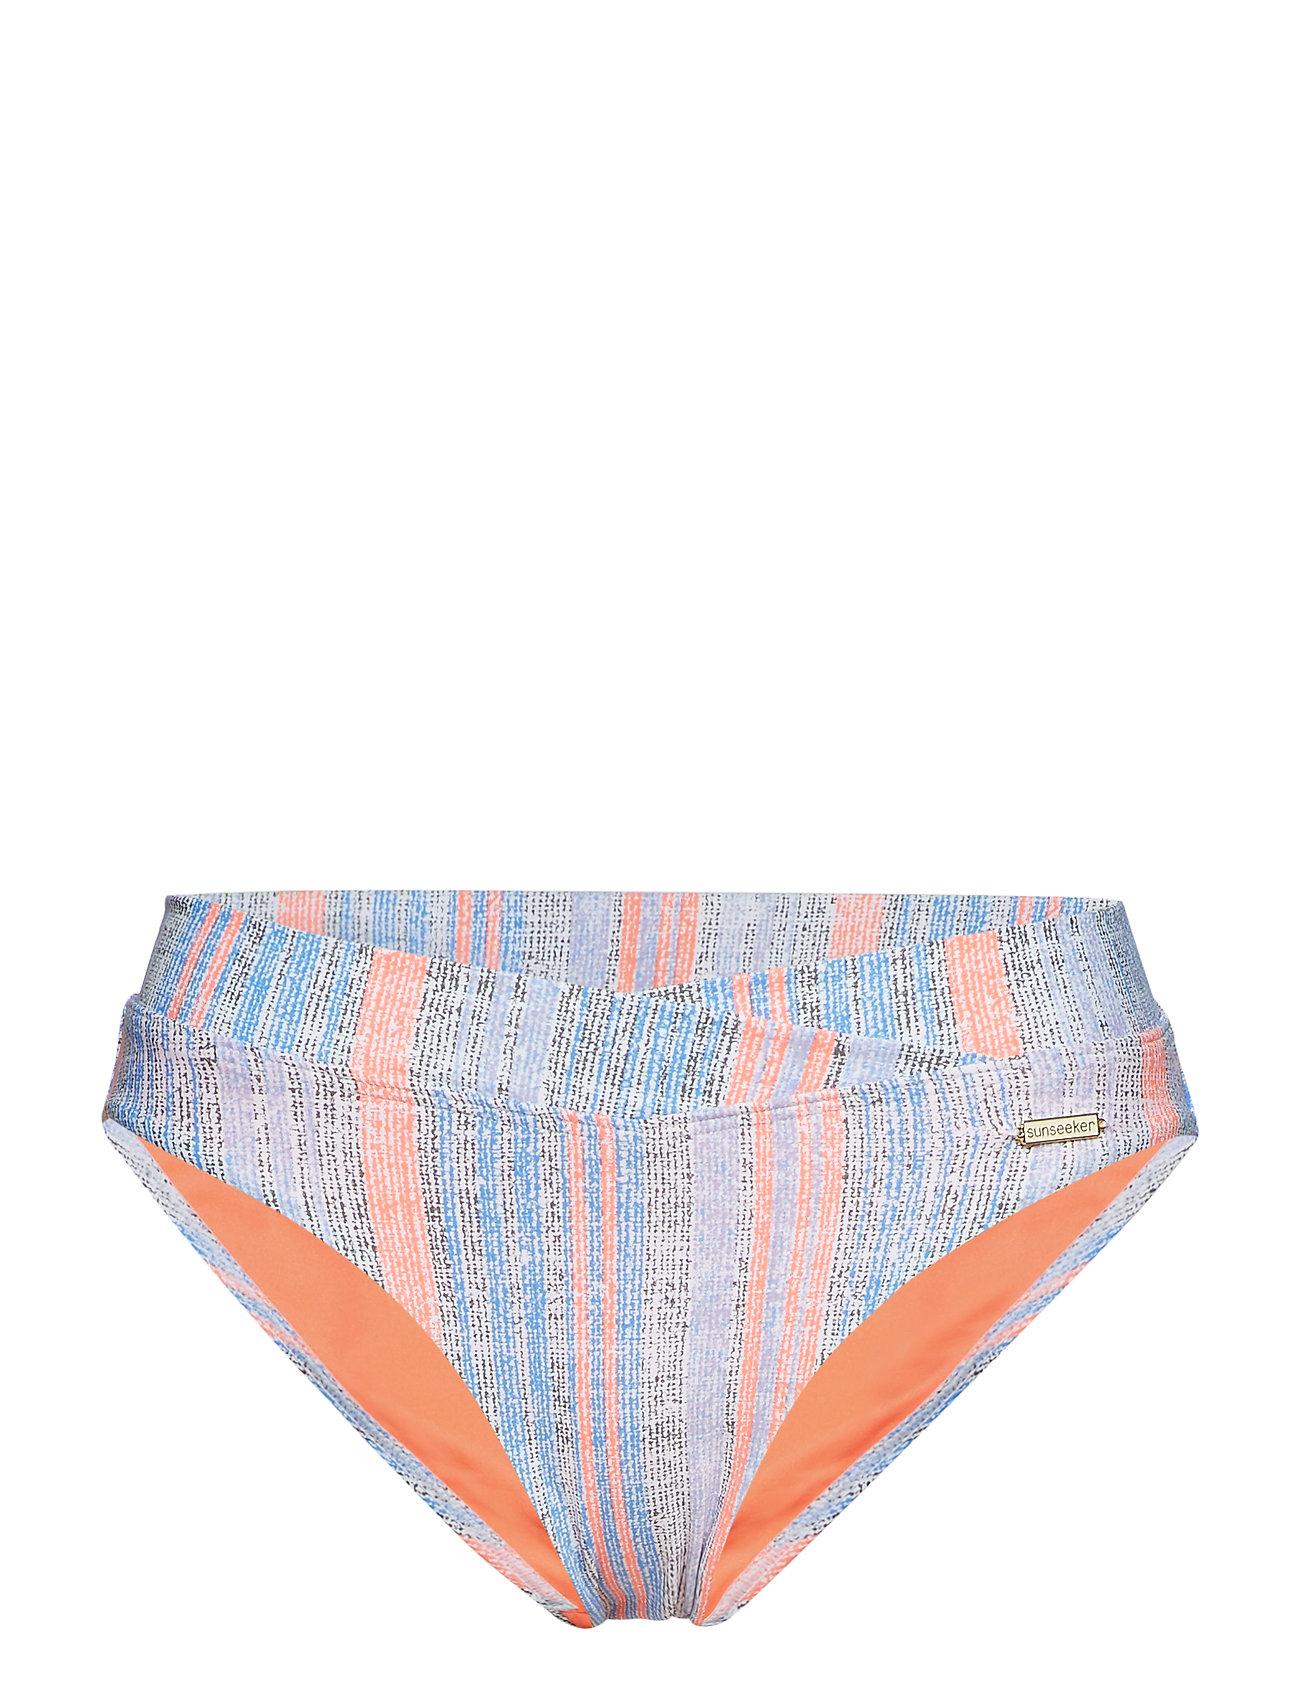 Sunseeker Bahamas Stripe FulClassic Pant - VISTA BLUE